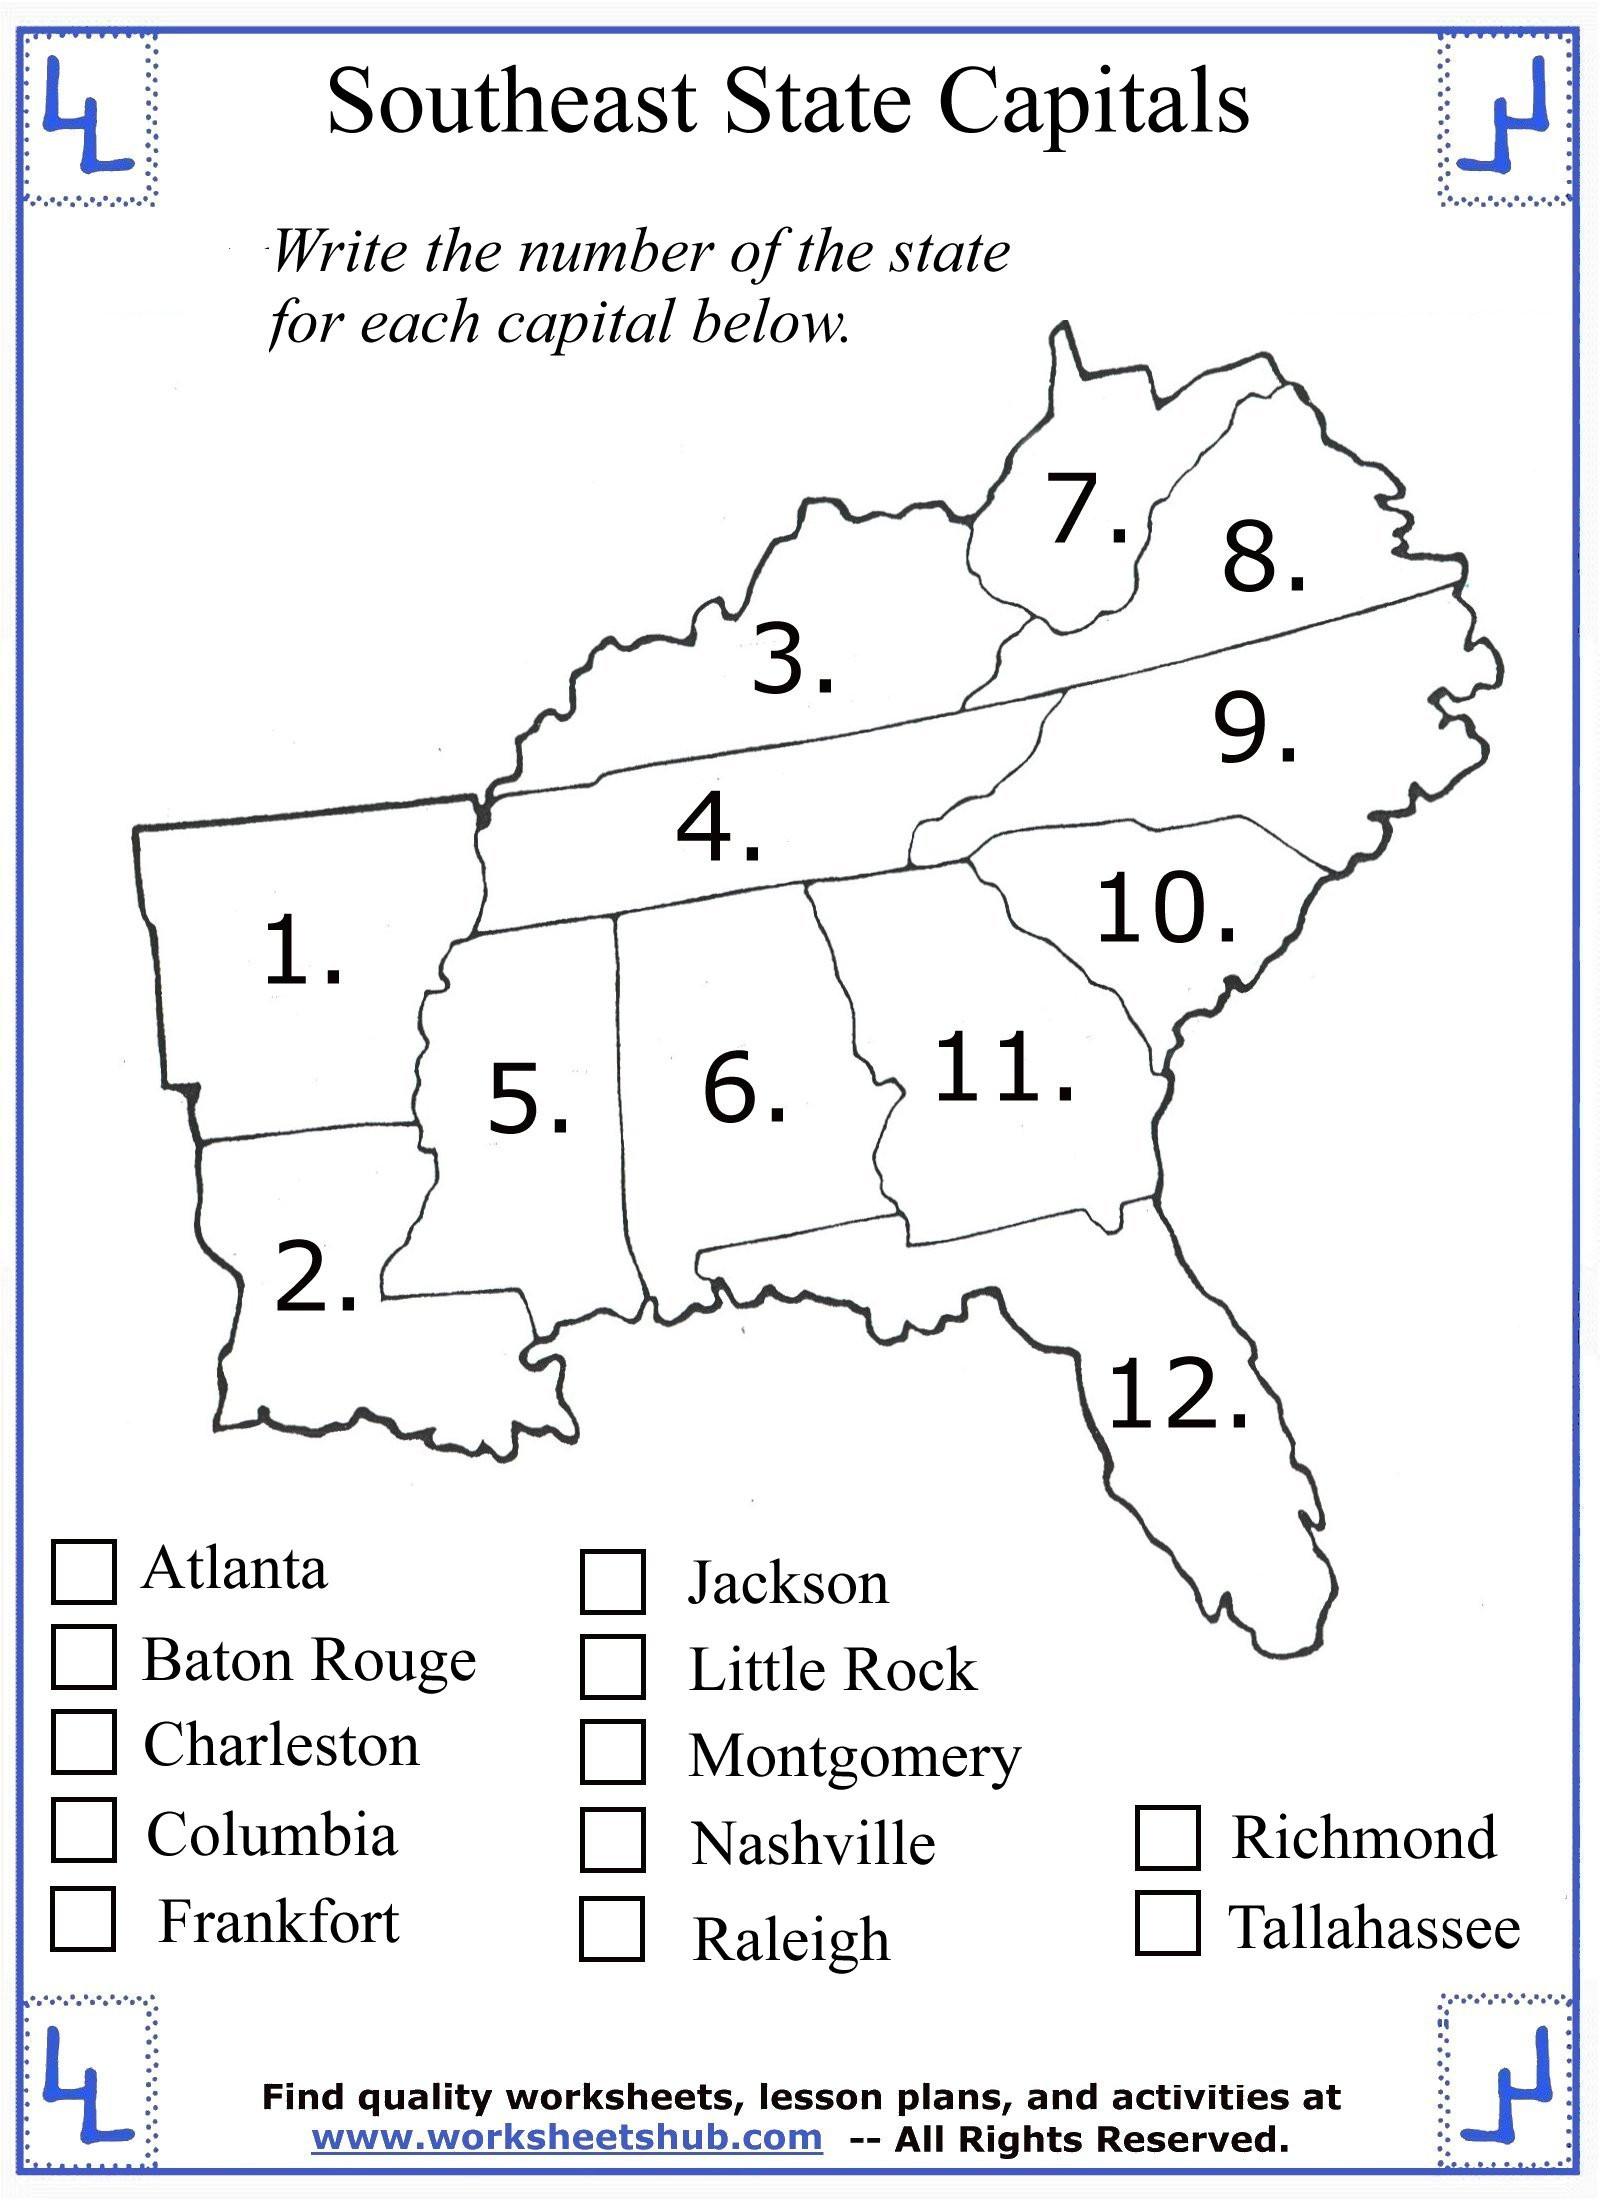 Second Grade social Studies Worksheets 4th Grade social Stu S southeast Region States